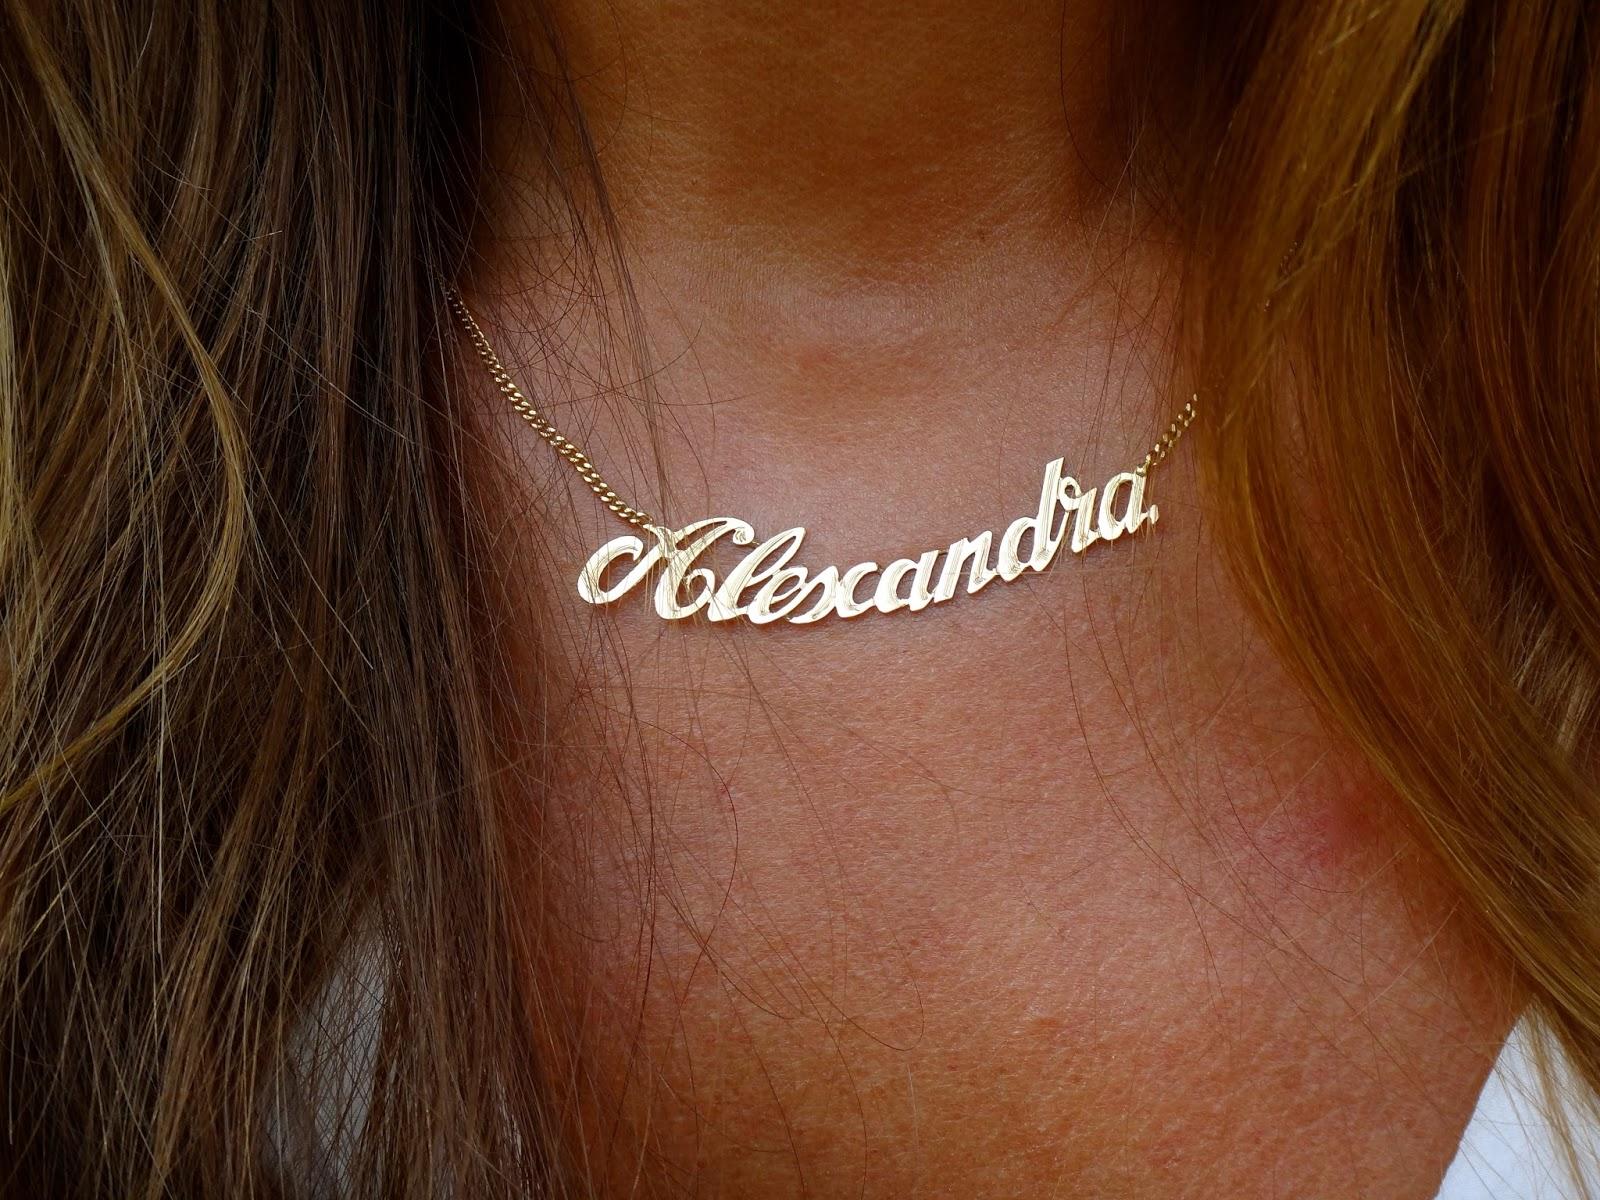 collier prenom alexandra